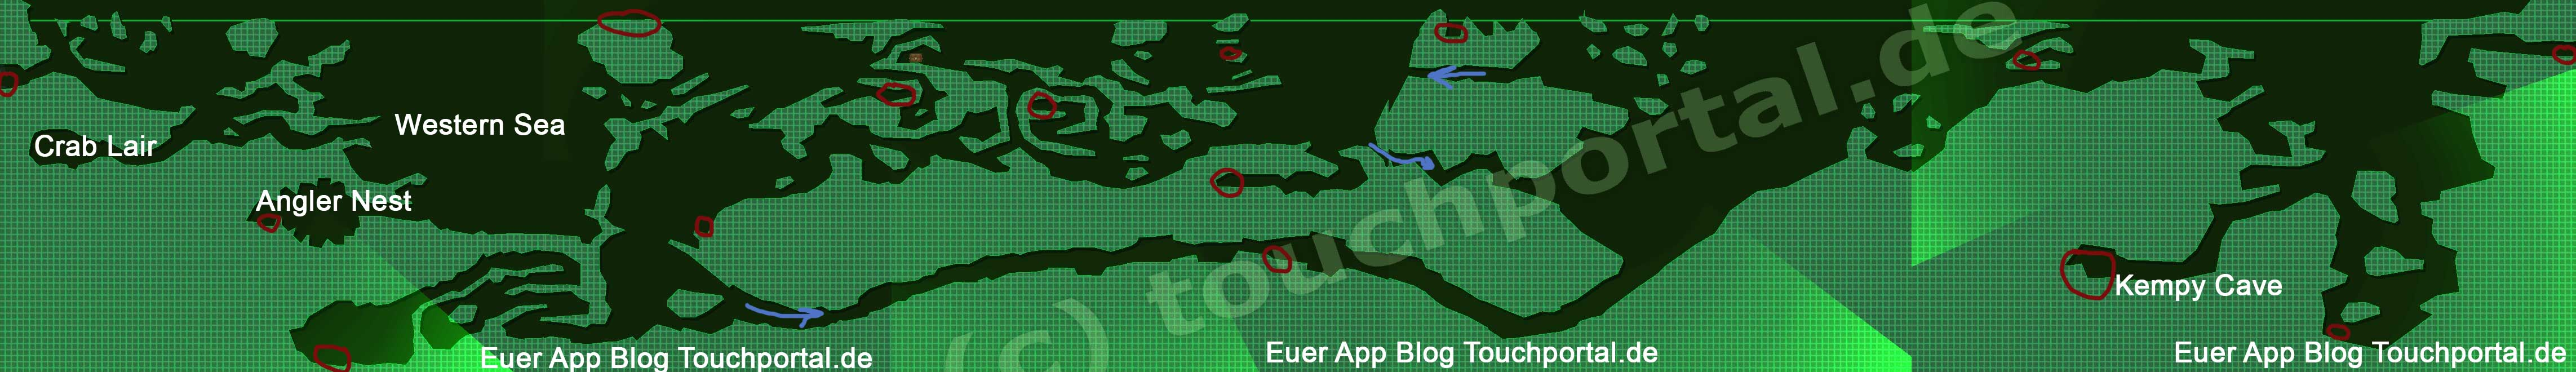 hungry shark evolution karte Hungry Shark Evolution Karte und Missionen › Touchportal hungry shark evolution karte